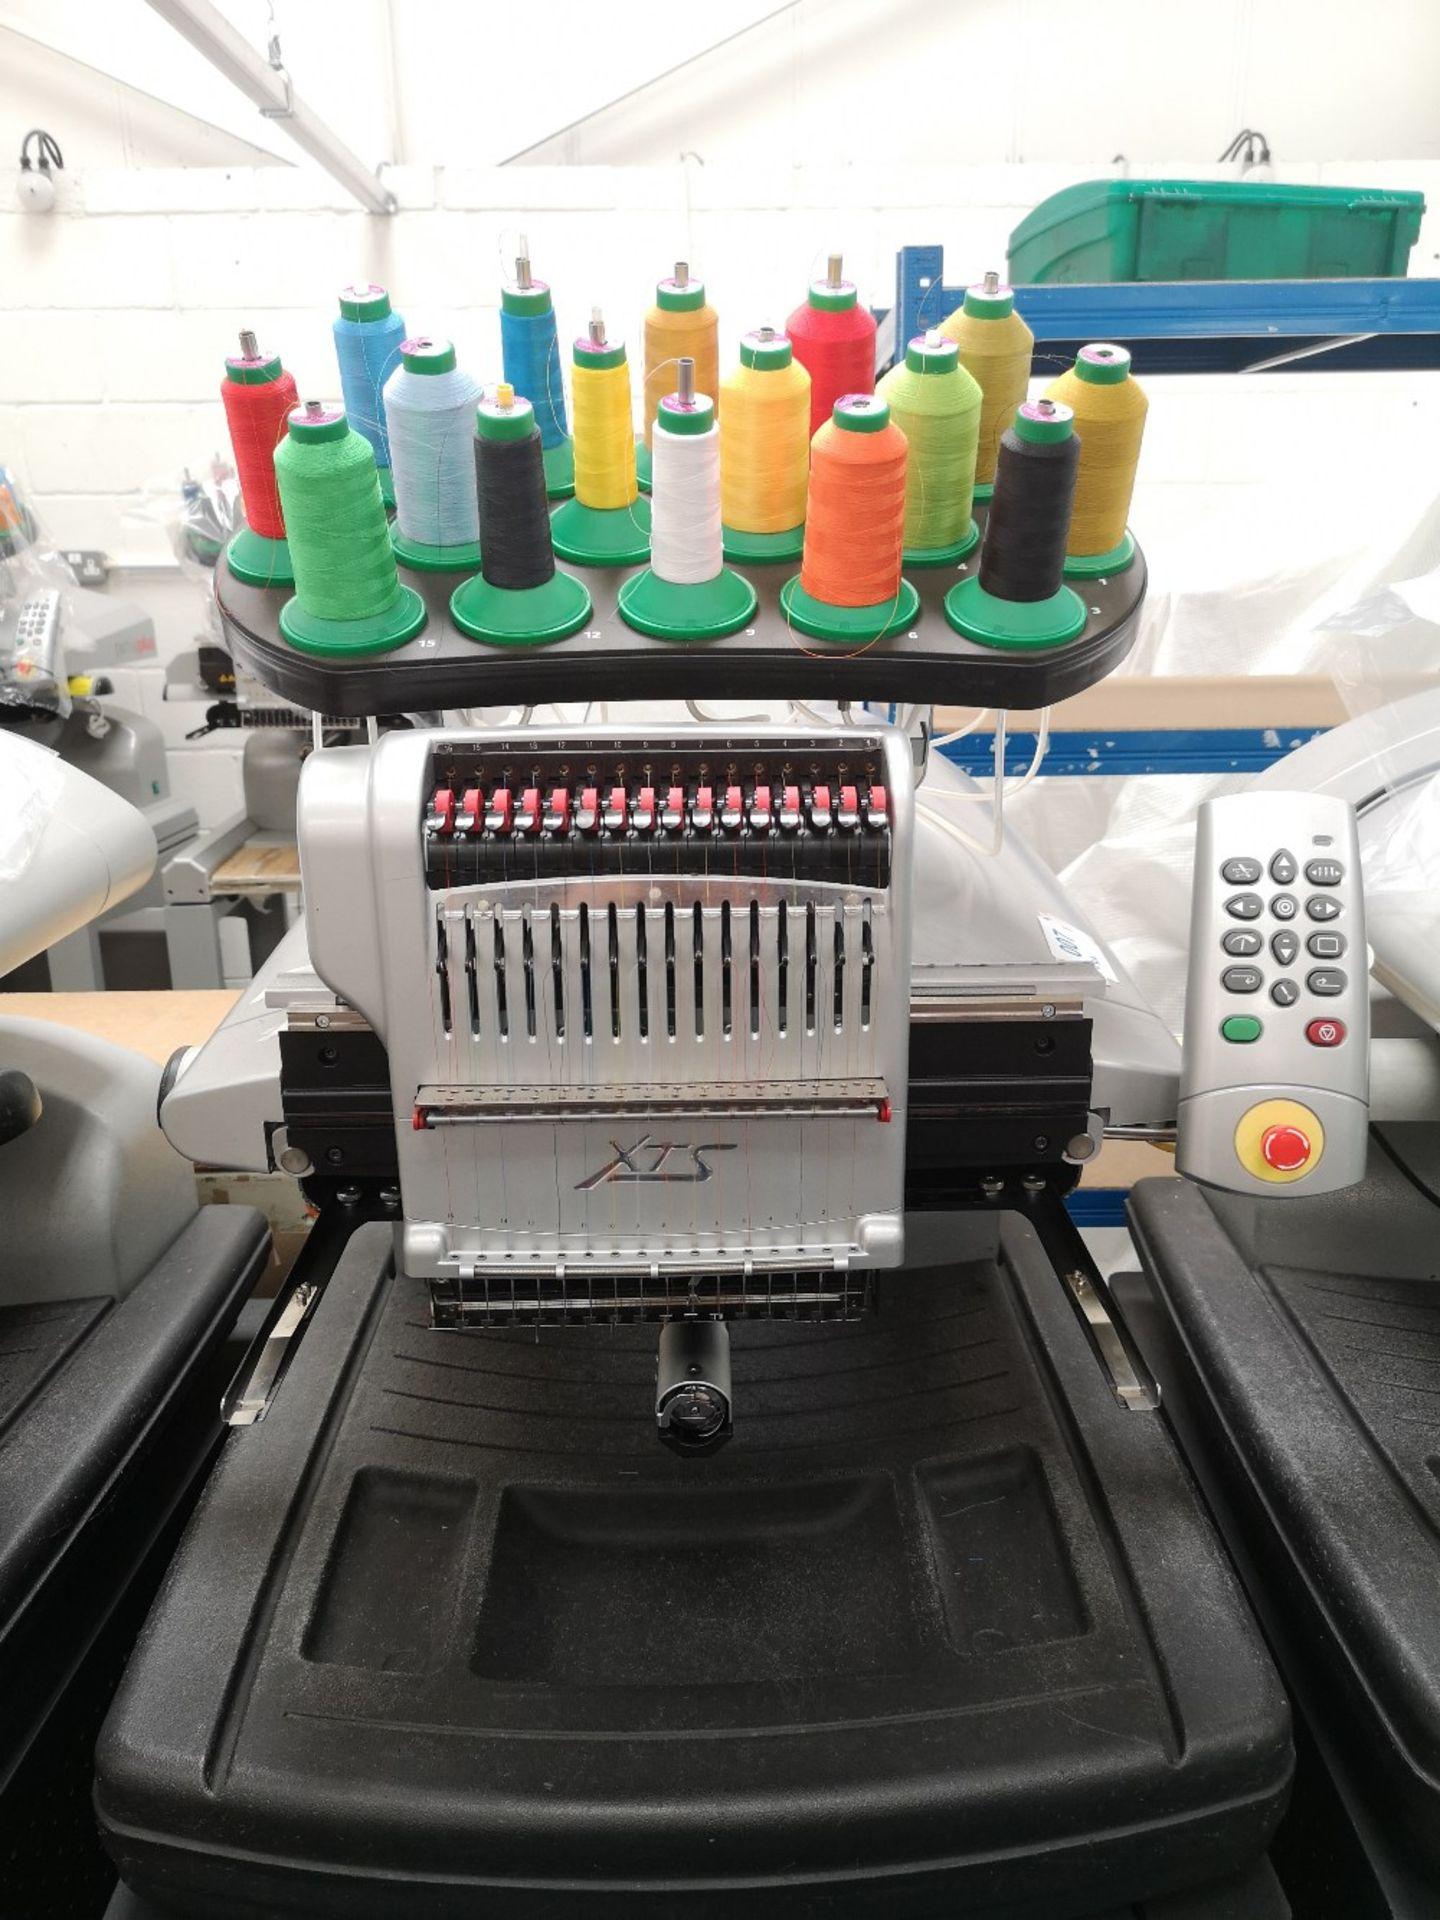 MELCO Amaya Embroidery machine XTS PN SRR30000-10 - Image 3 of 4